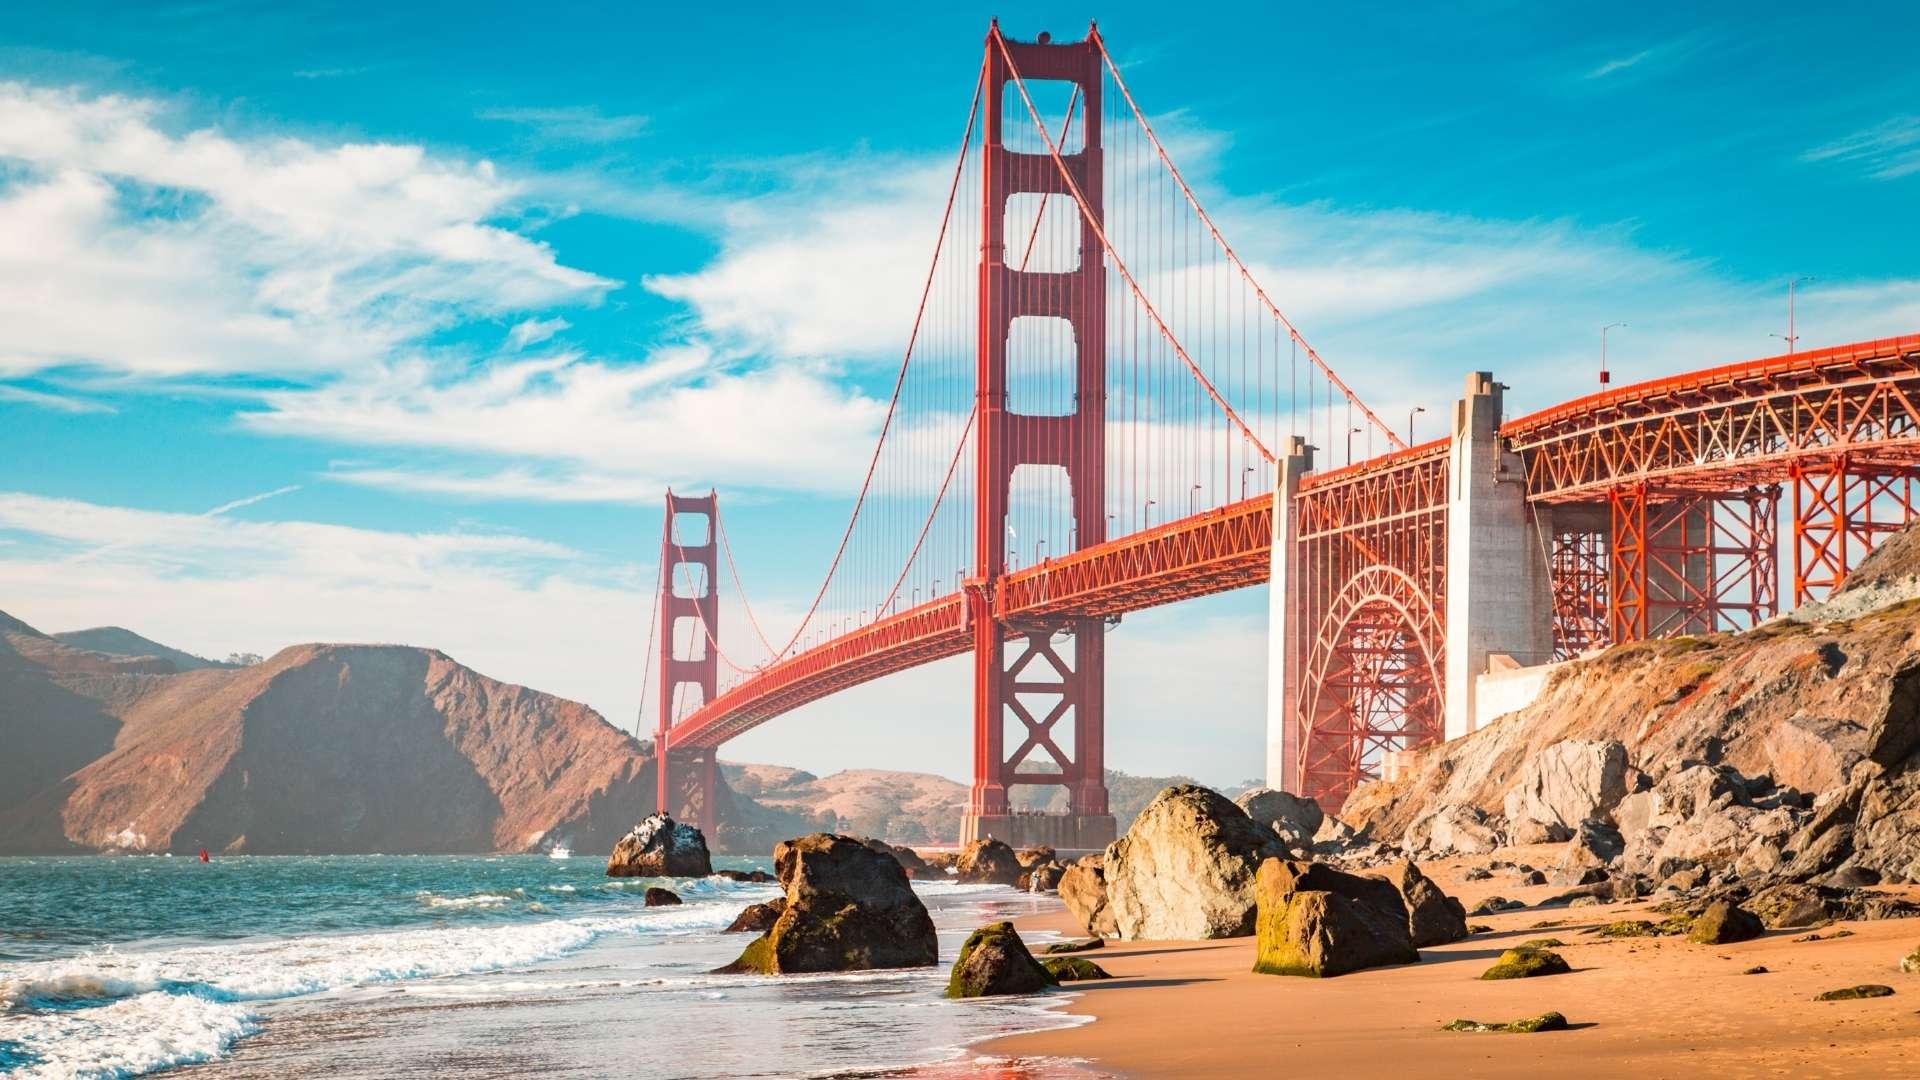 Golden_Gate_Bridge_San_Francisco_1920x1080.jpg